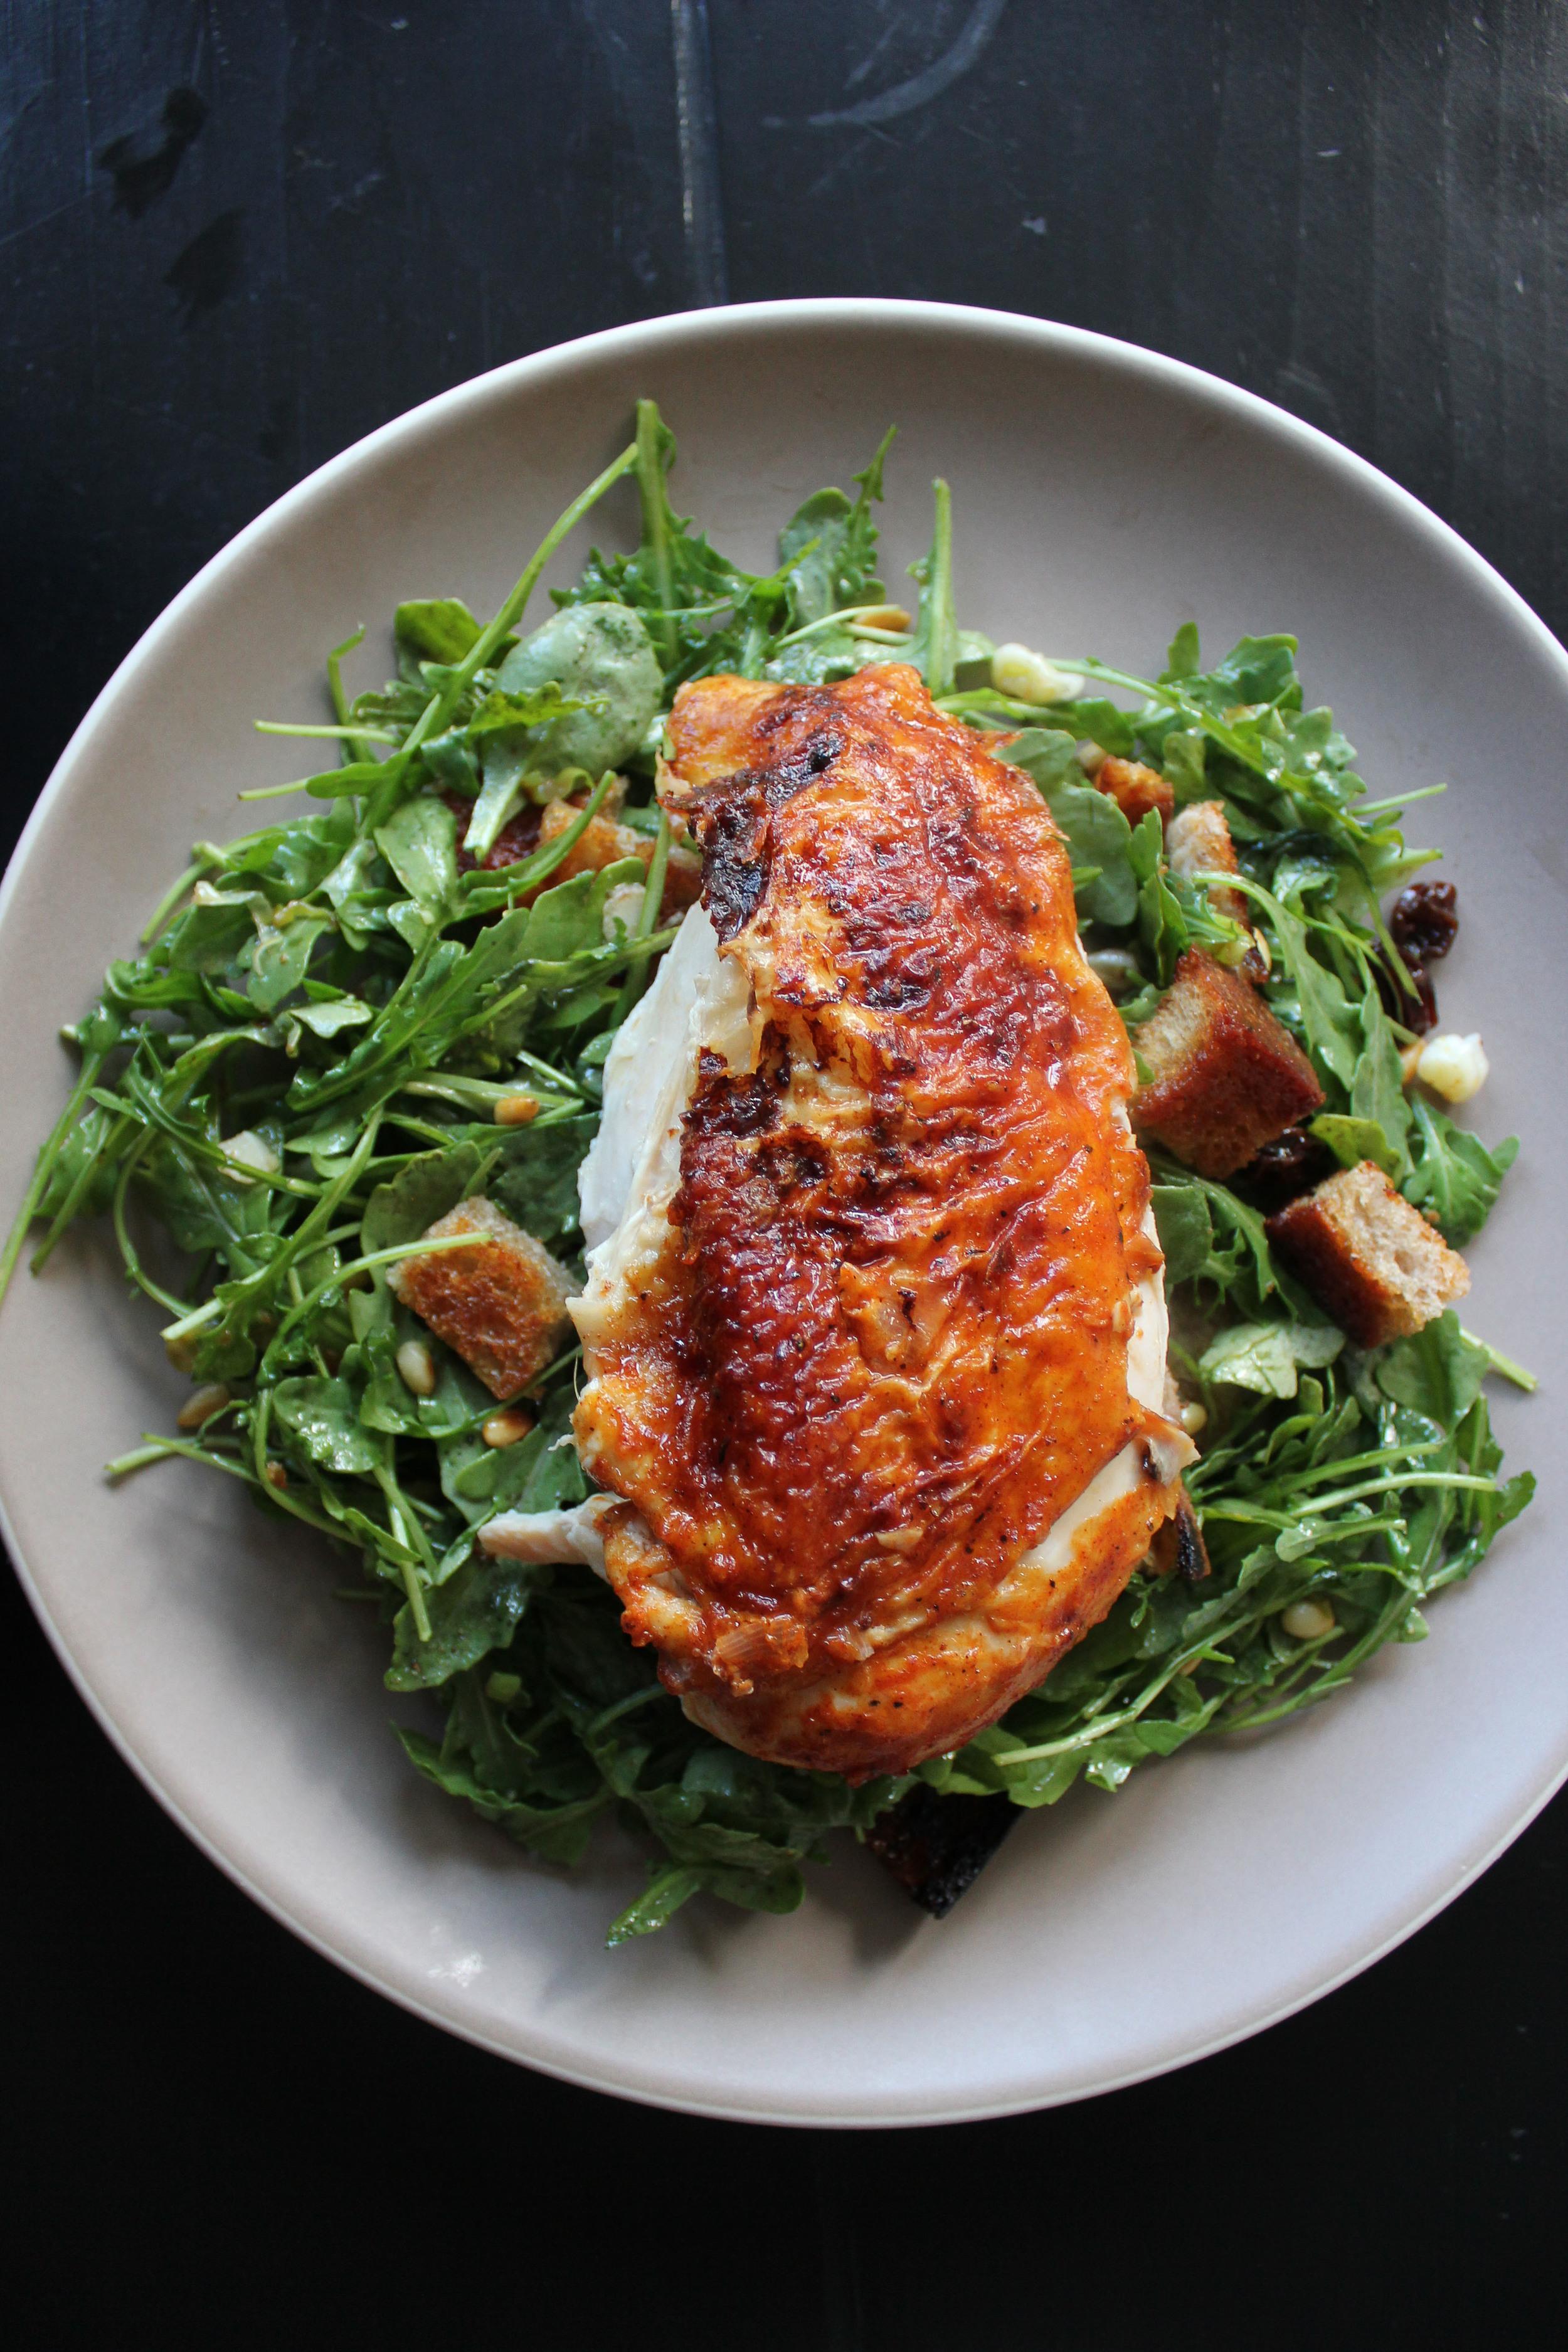 The Standard Grill's million dollar chicken + Zuni Cafe bread salad - Fancy Casual